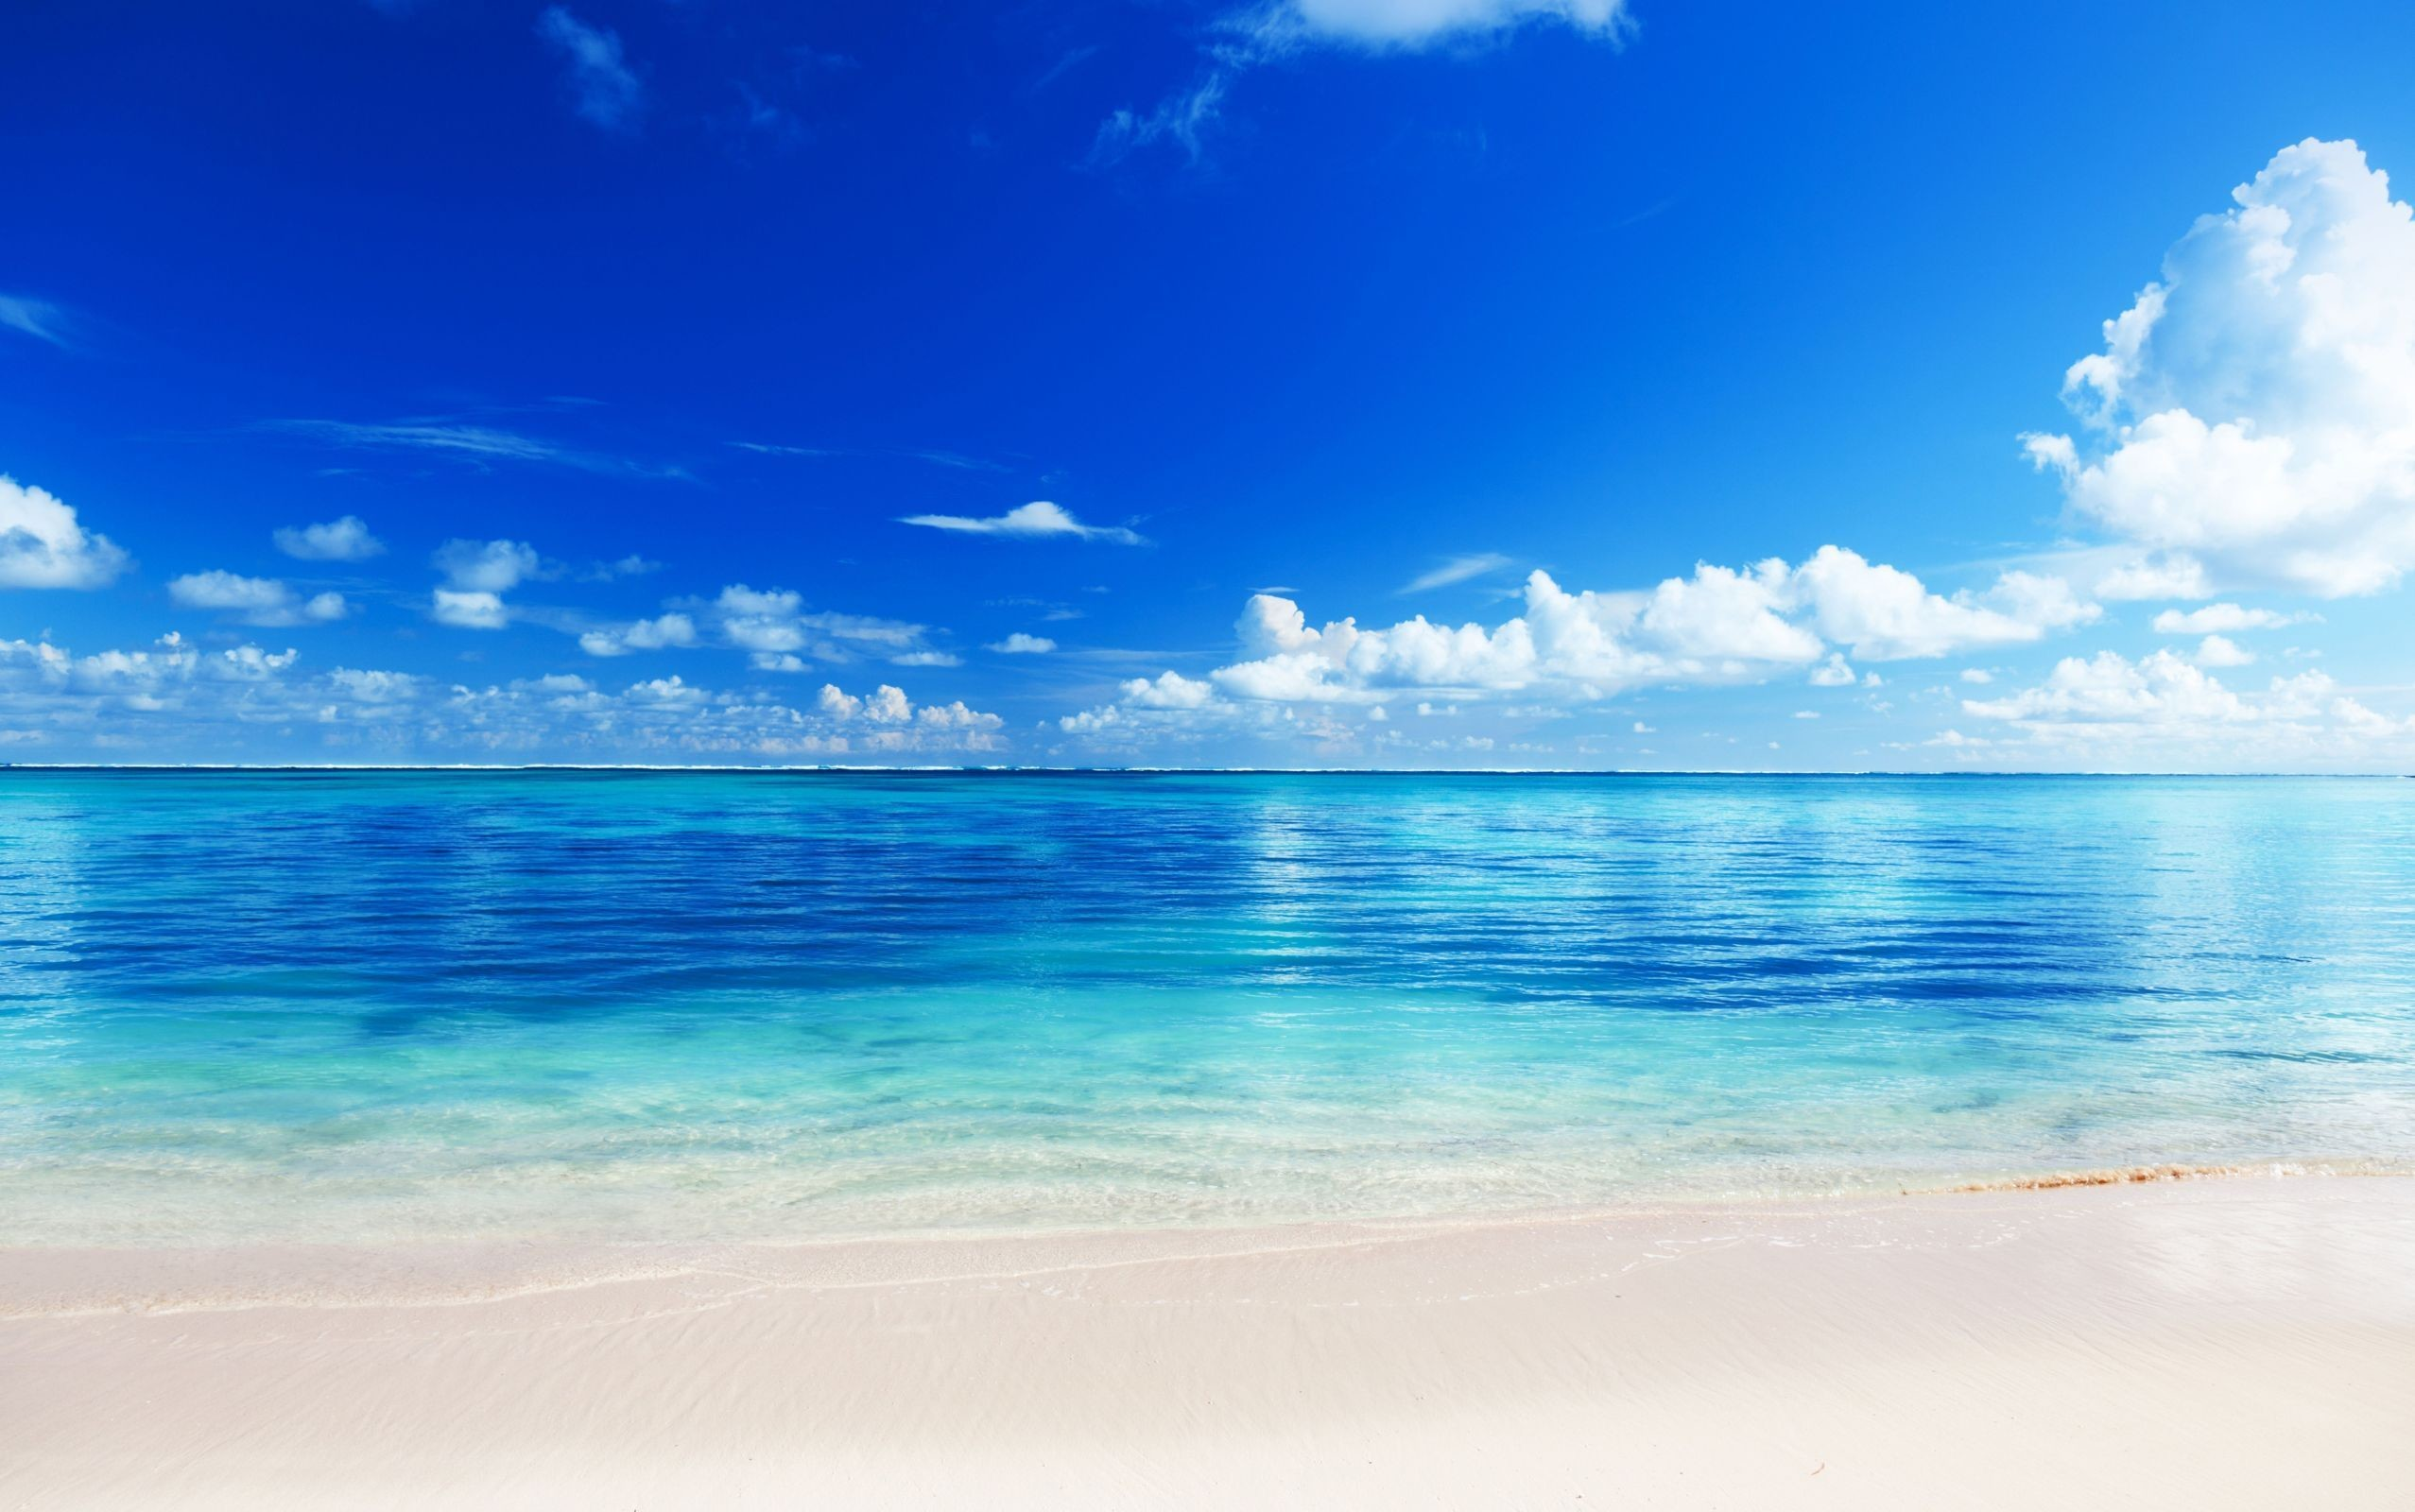 beach wallpapers   Desktop Backgrounds for Free HD Wallpaper   wall .